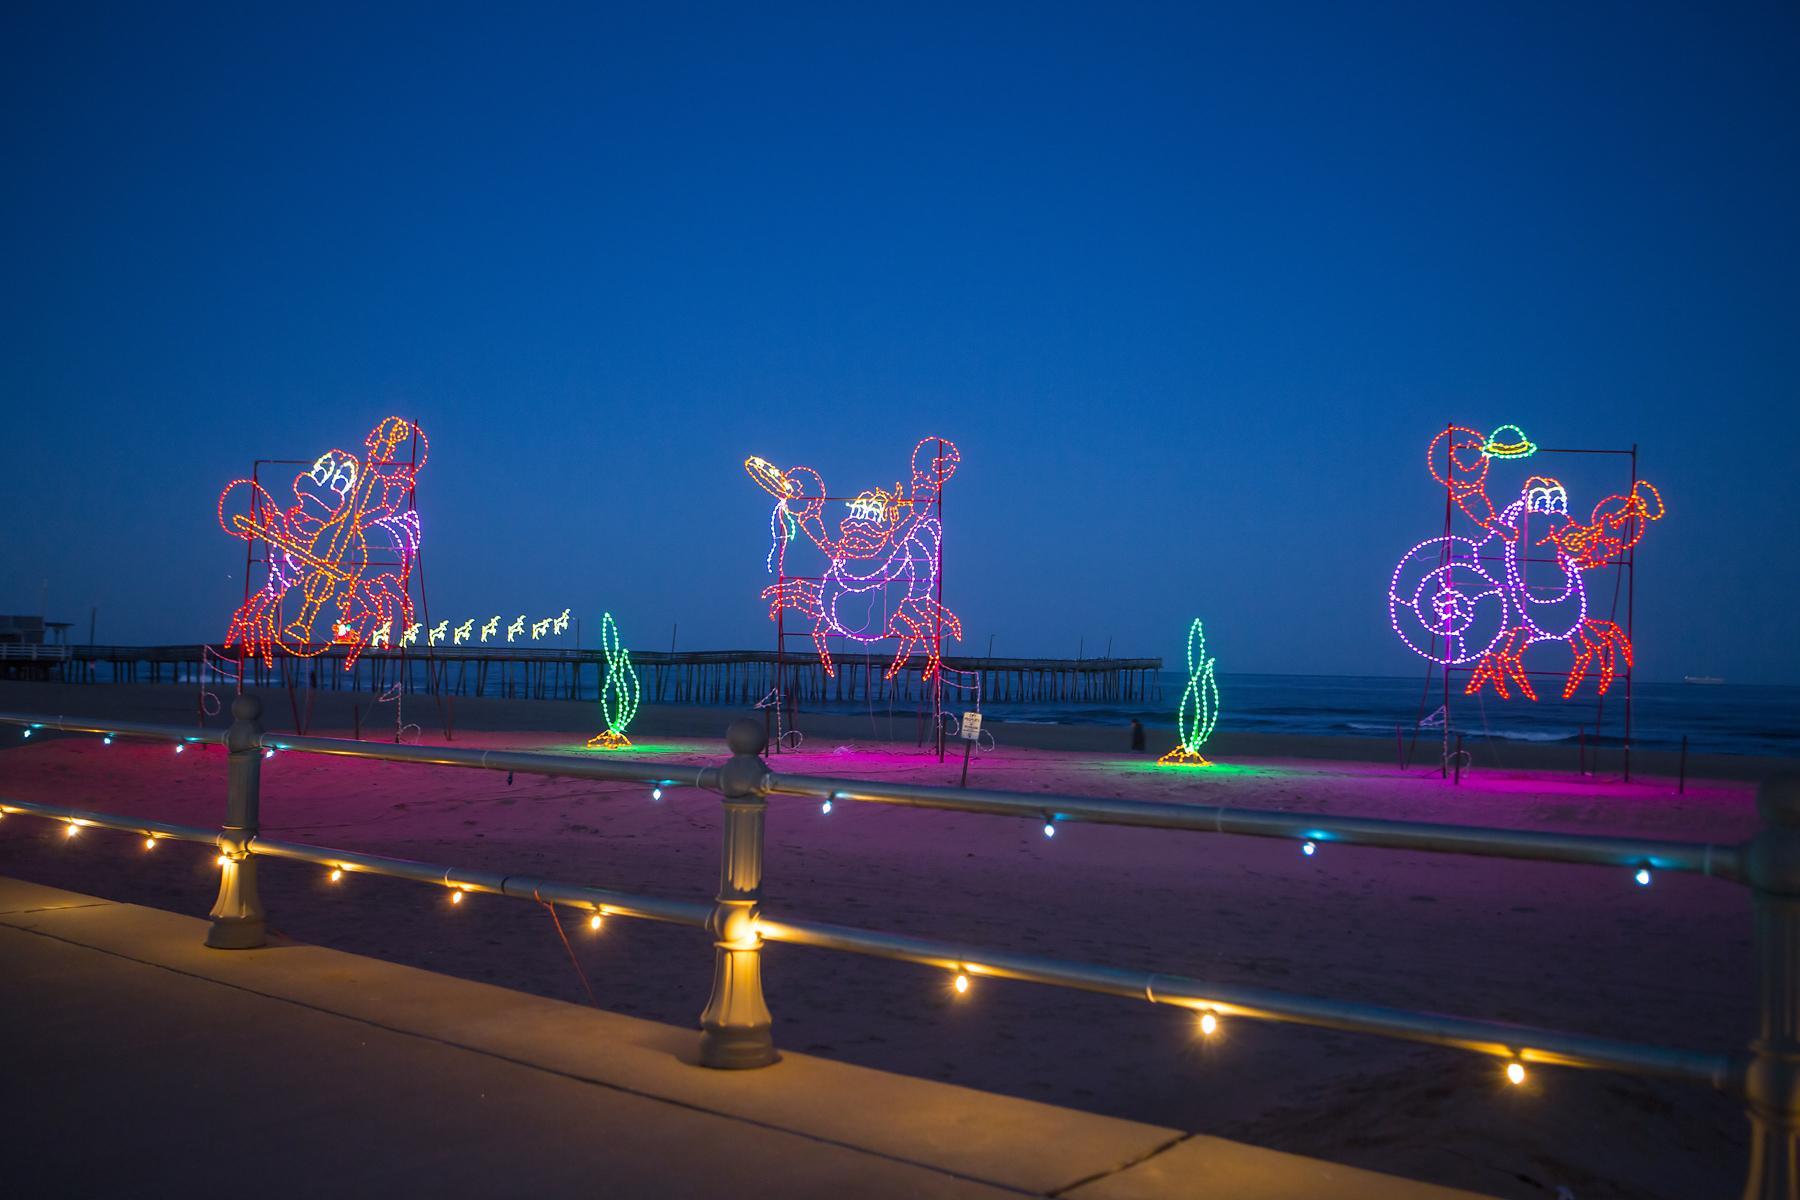 lights on the boardwalk